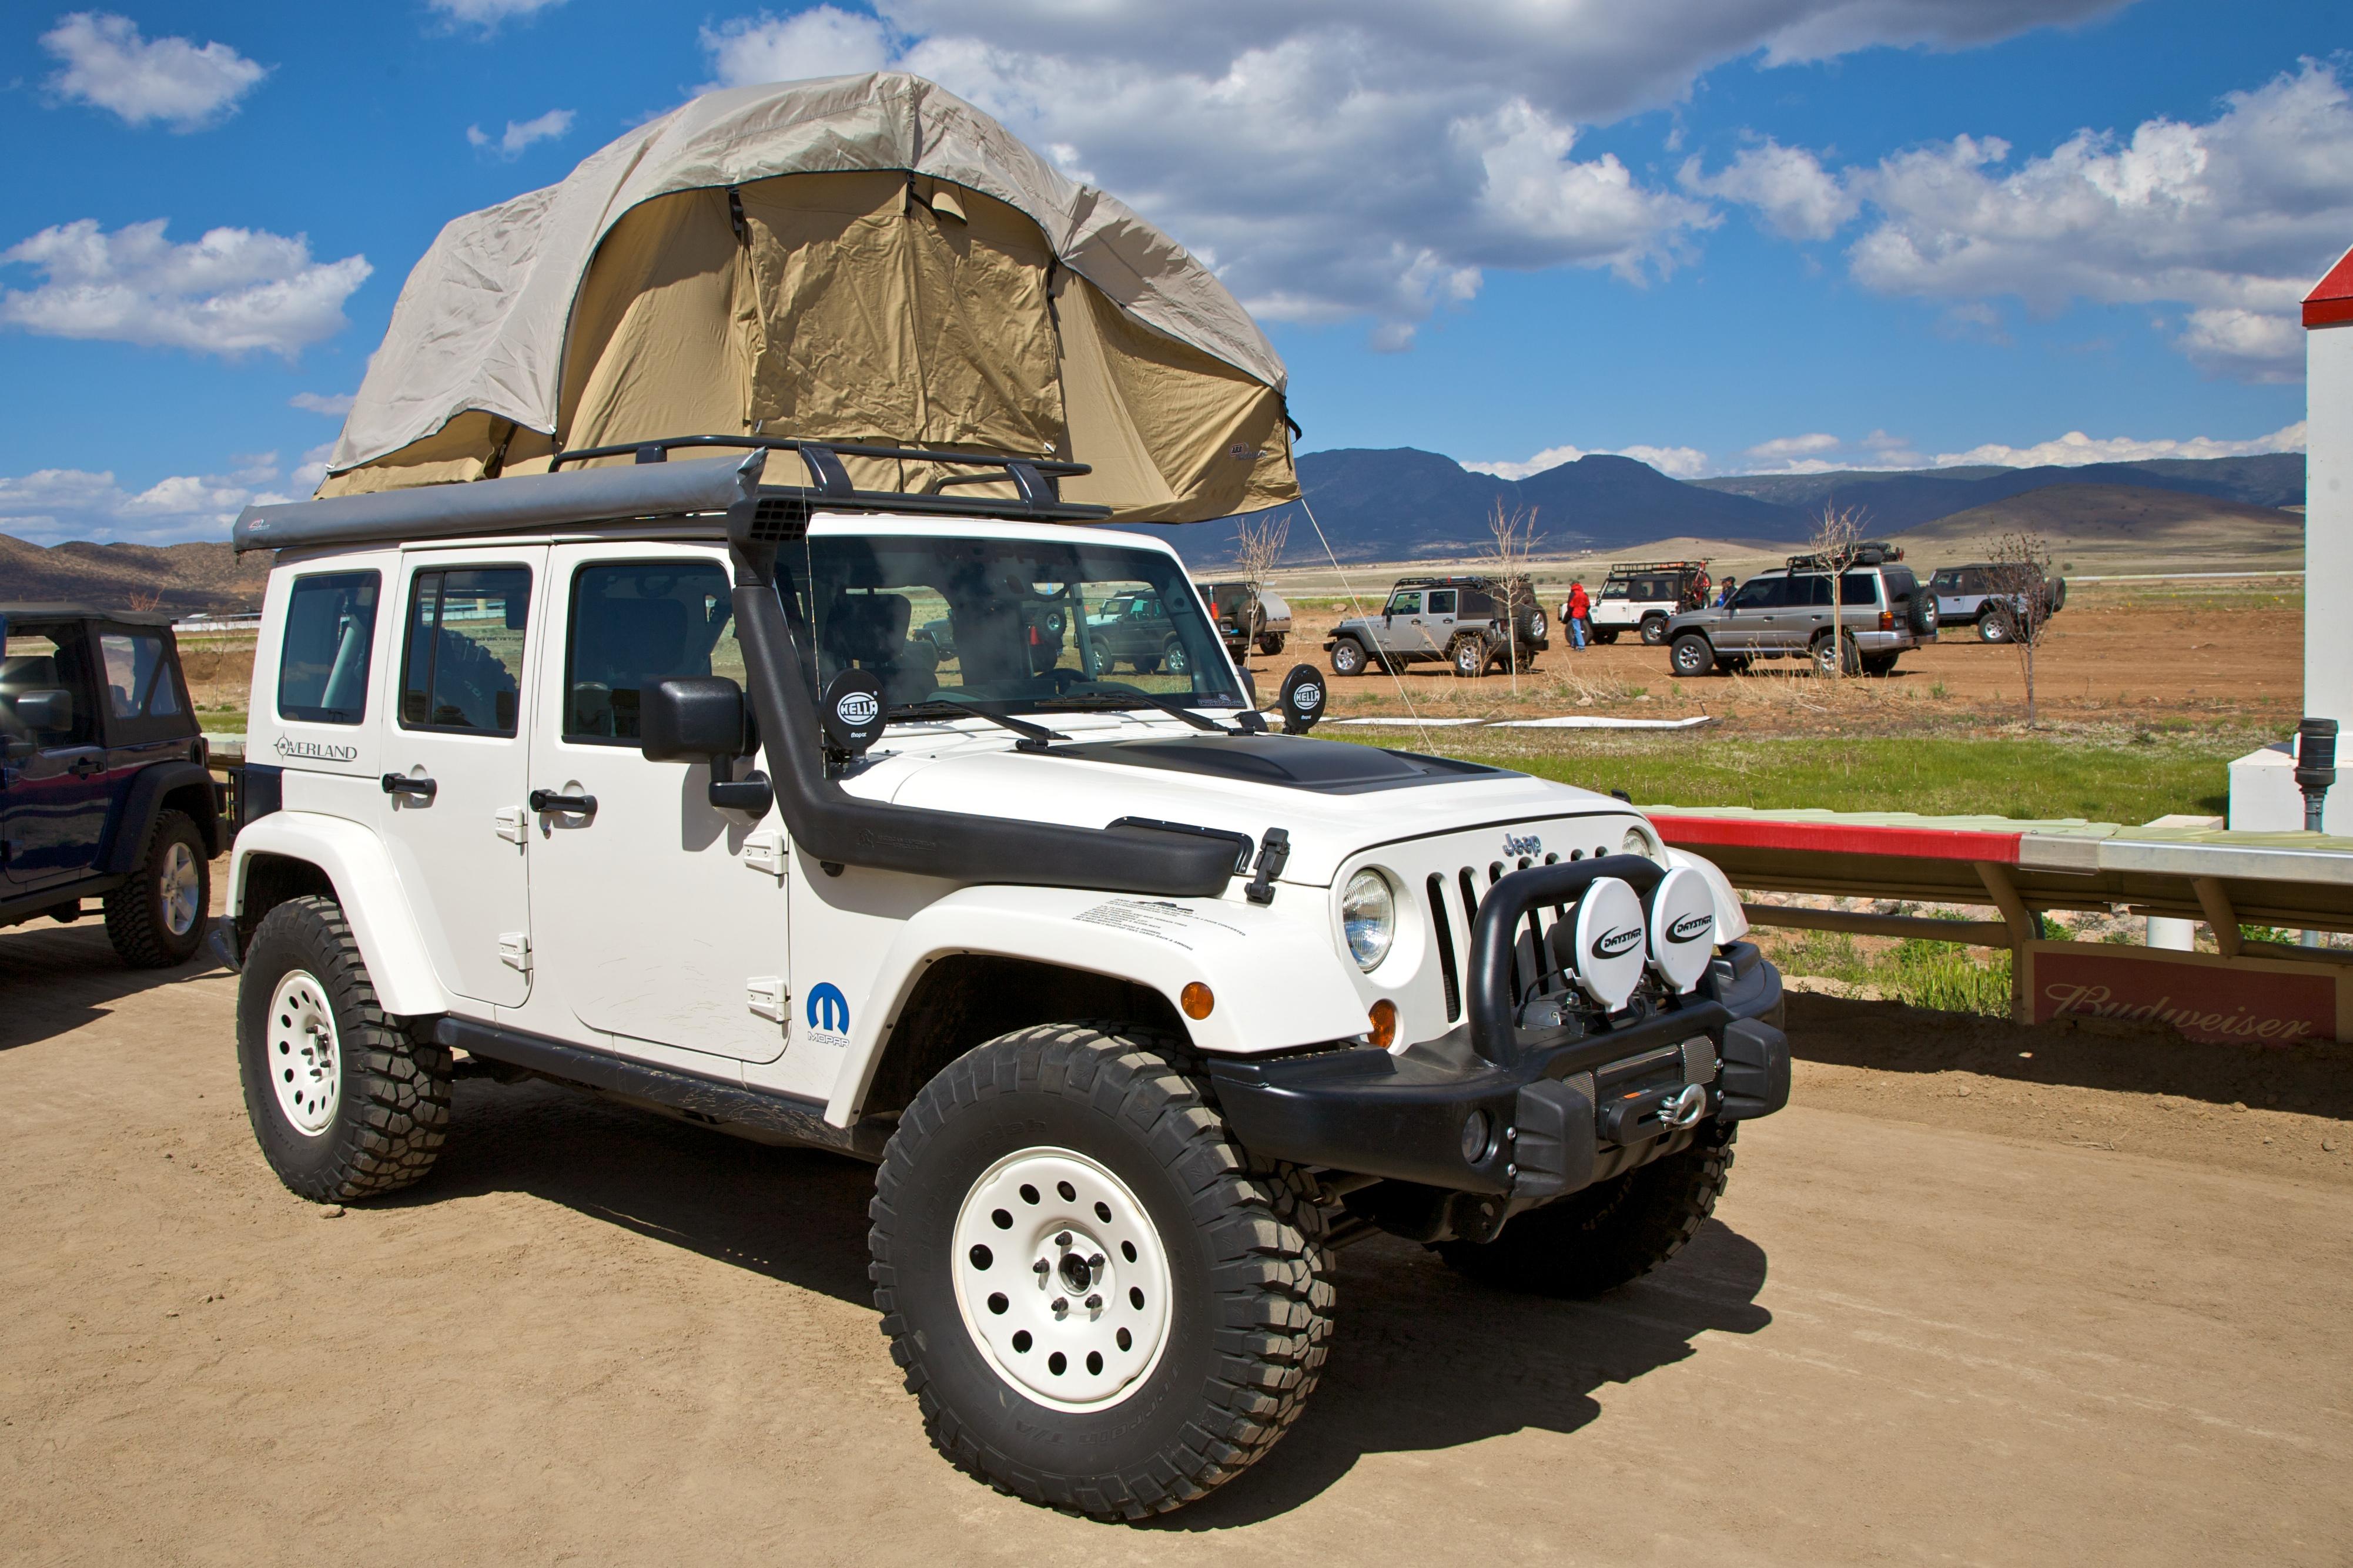 rent wranger jeep door four razor wranglers jeeps a and razors two